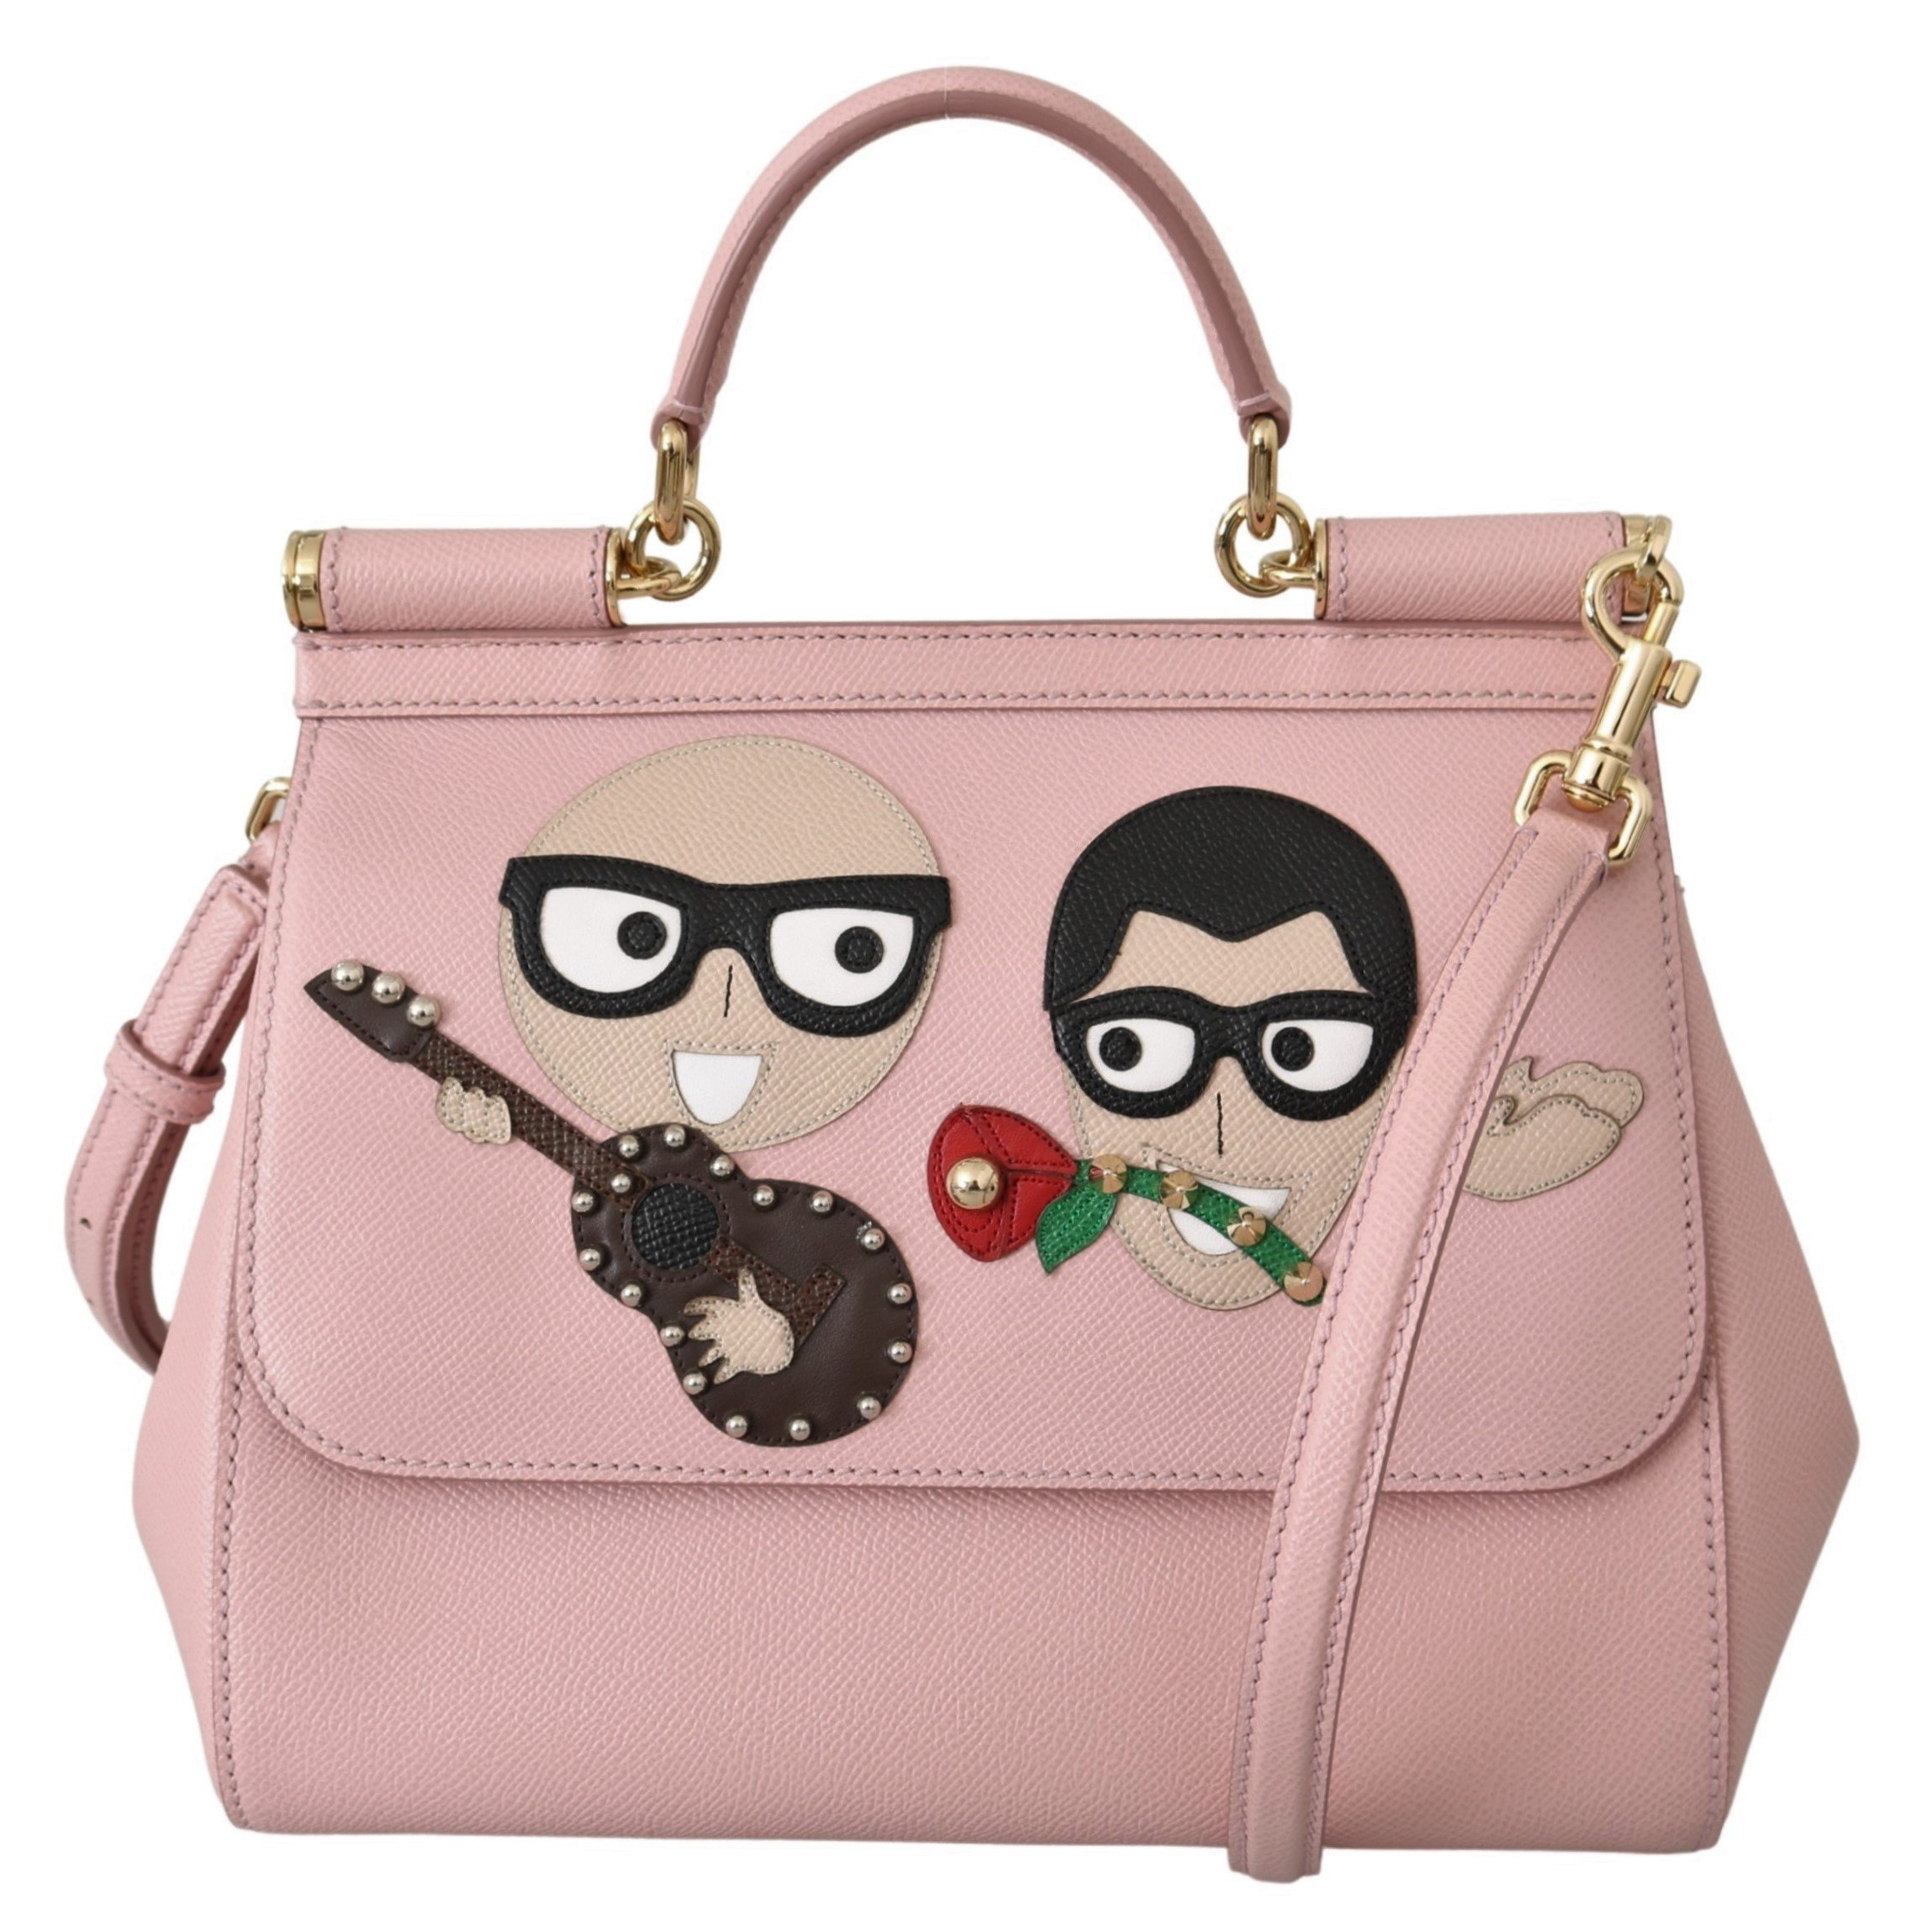 Dolce & Gabbana Women's Leather #dgfamily Shoulder Bag Pink VAS9787